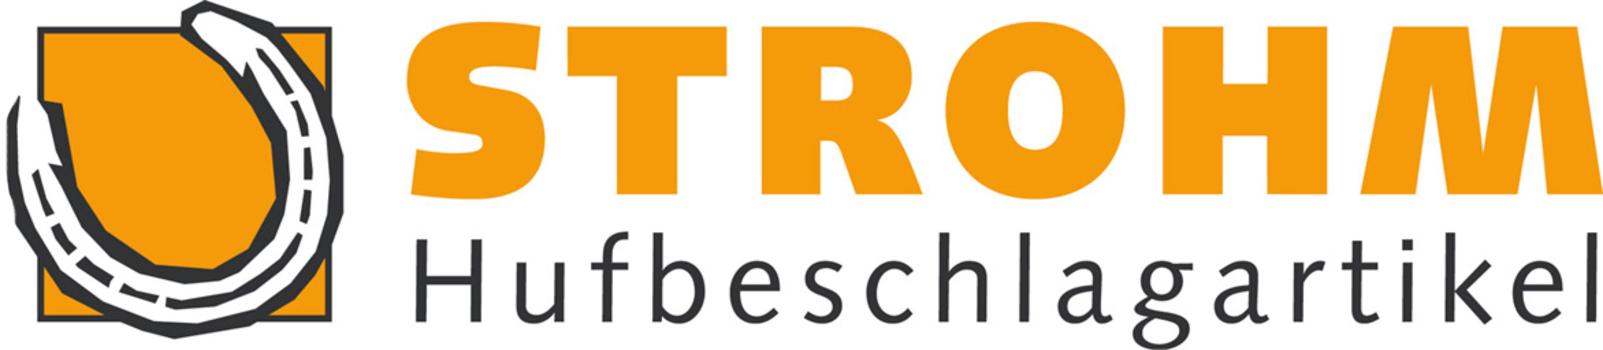 Andreas Strohm Hufbeschlagartikel e.K. Logo